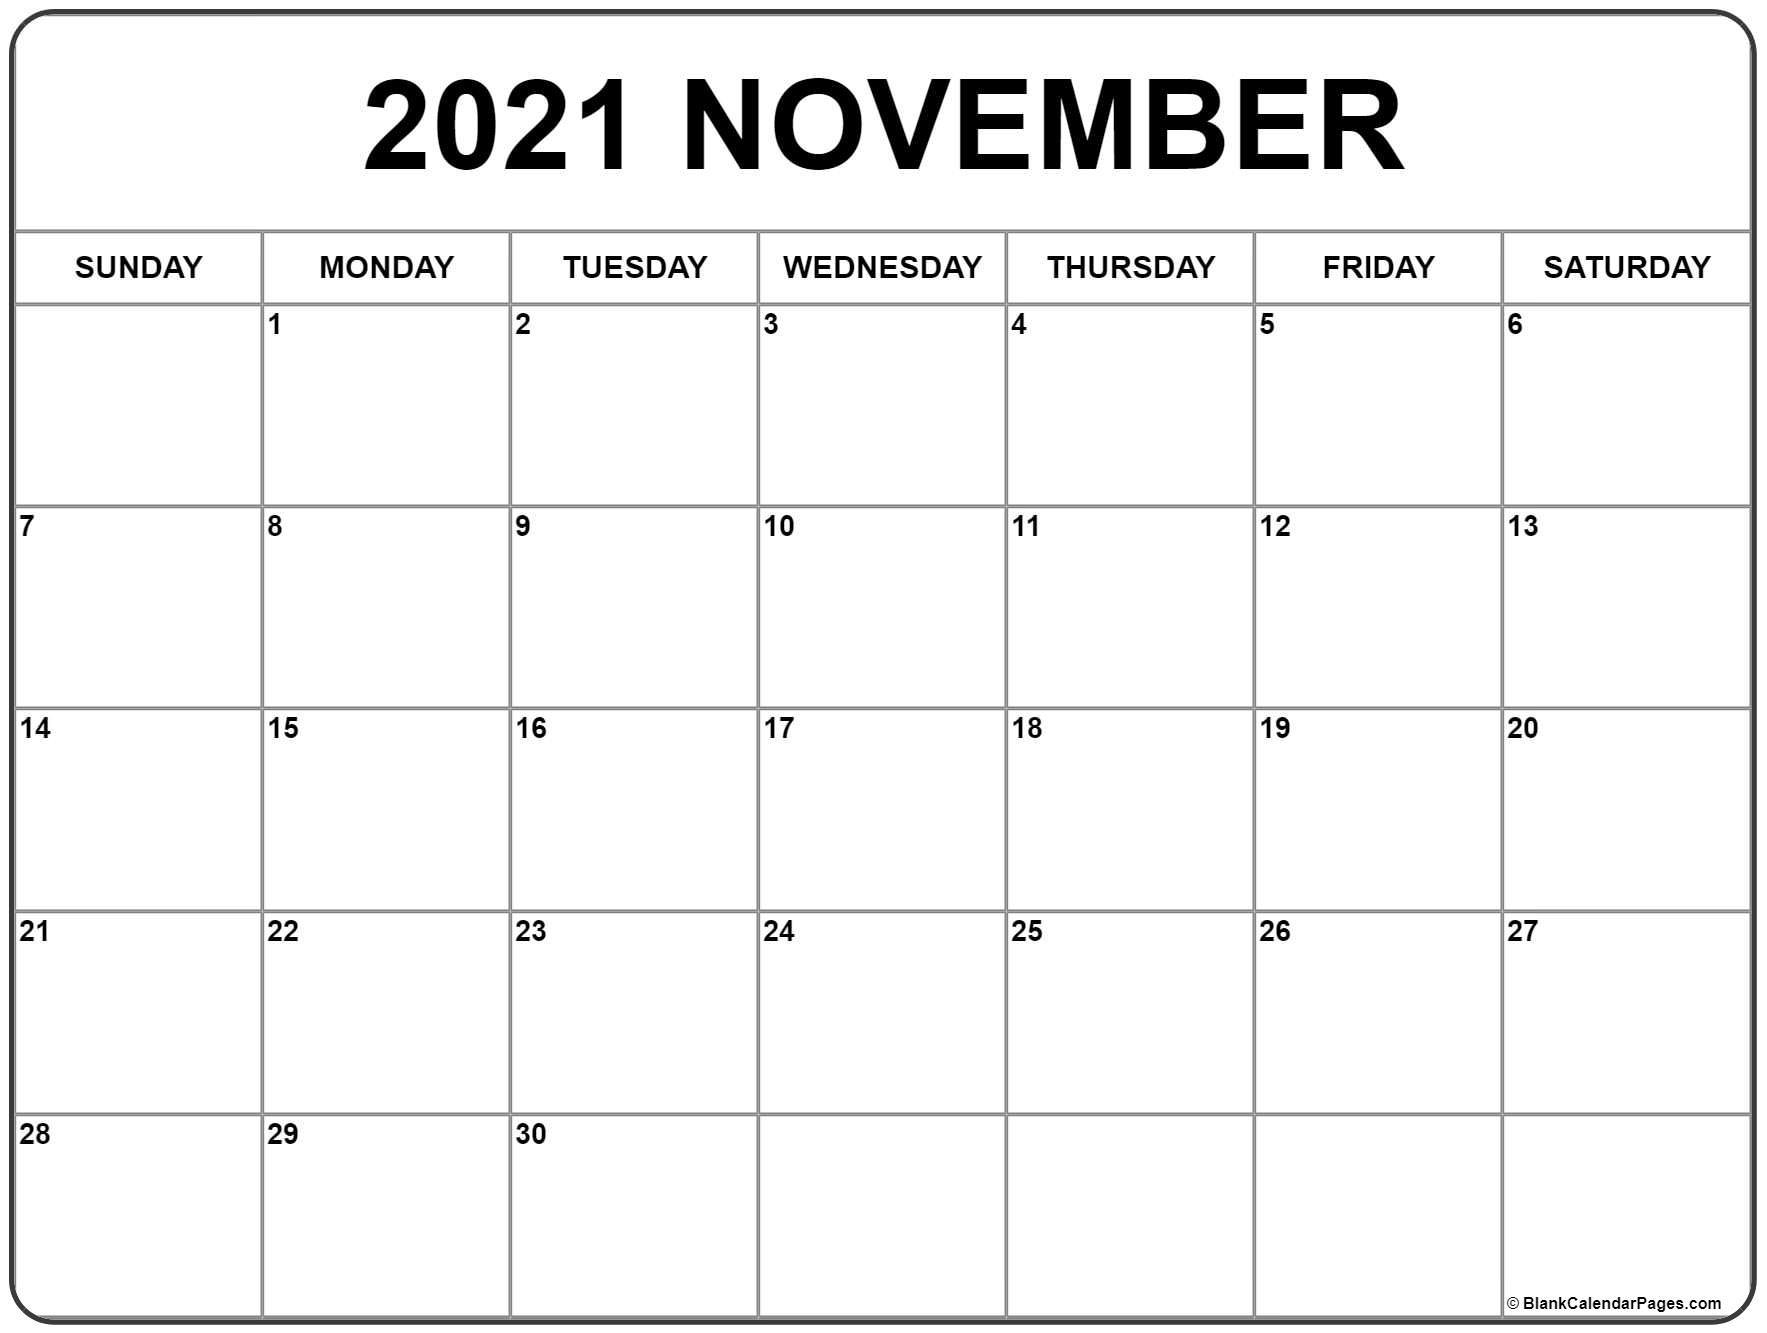 November 2021 Calendar | Free Printable Monthly Calendars  Calendar 2021 2021 2021 Printable Free